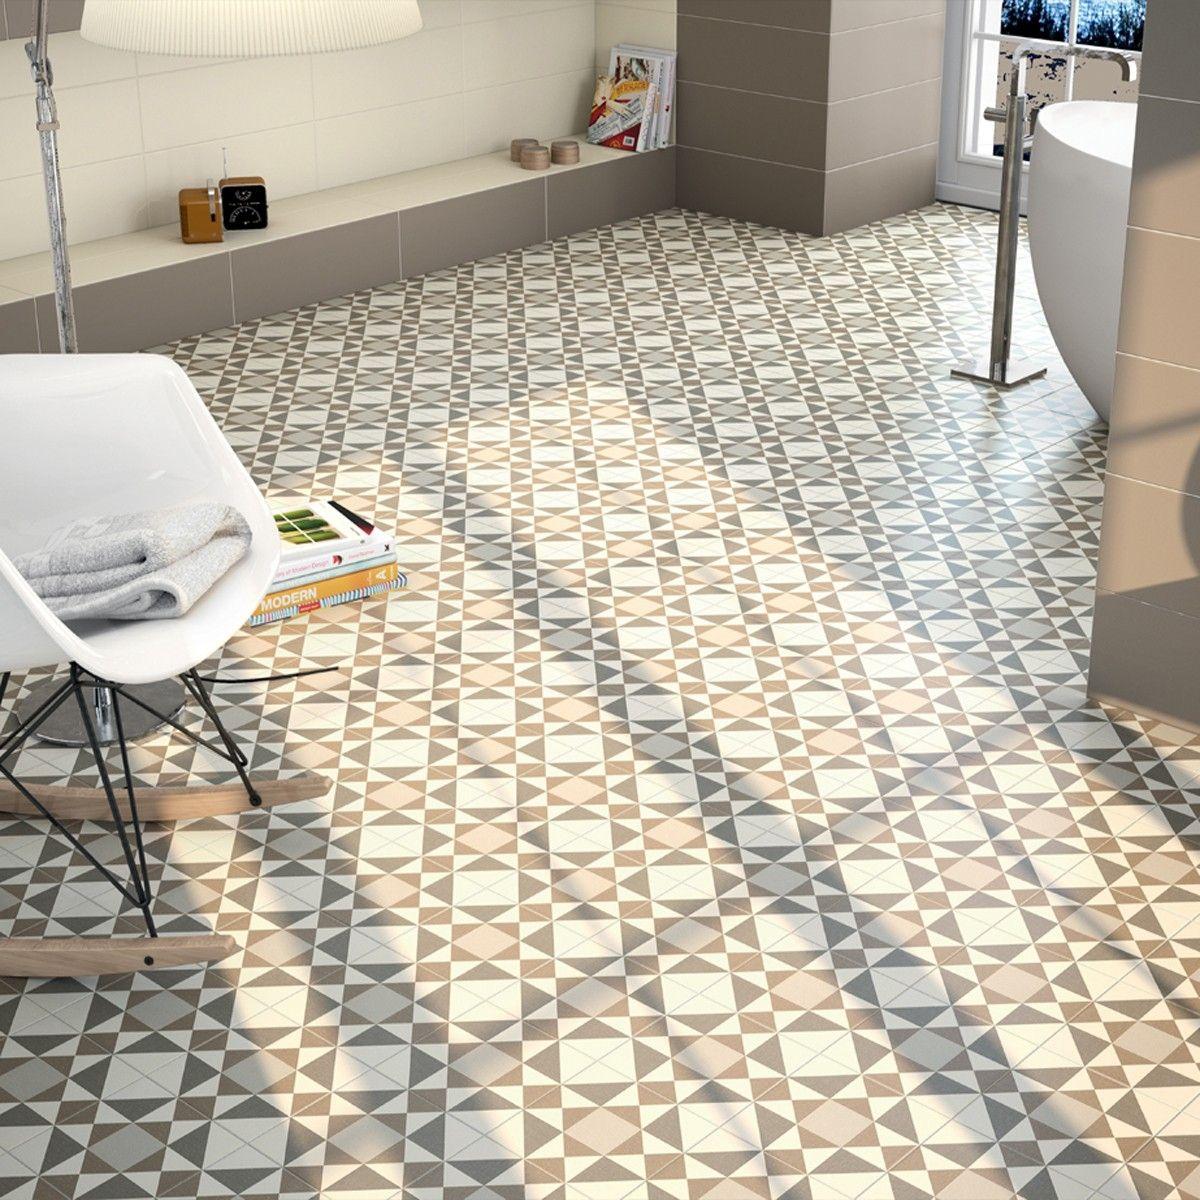 sheen home depot and ceramic merola flooring grey in patterned petal low charcoal n the x floor twenties tile white b